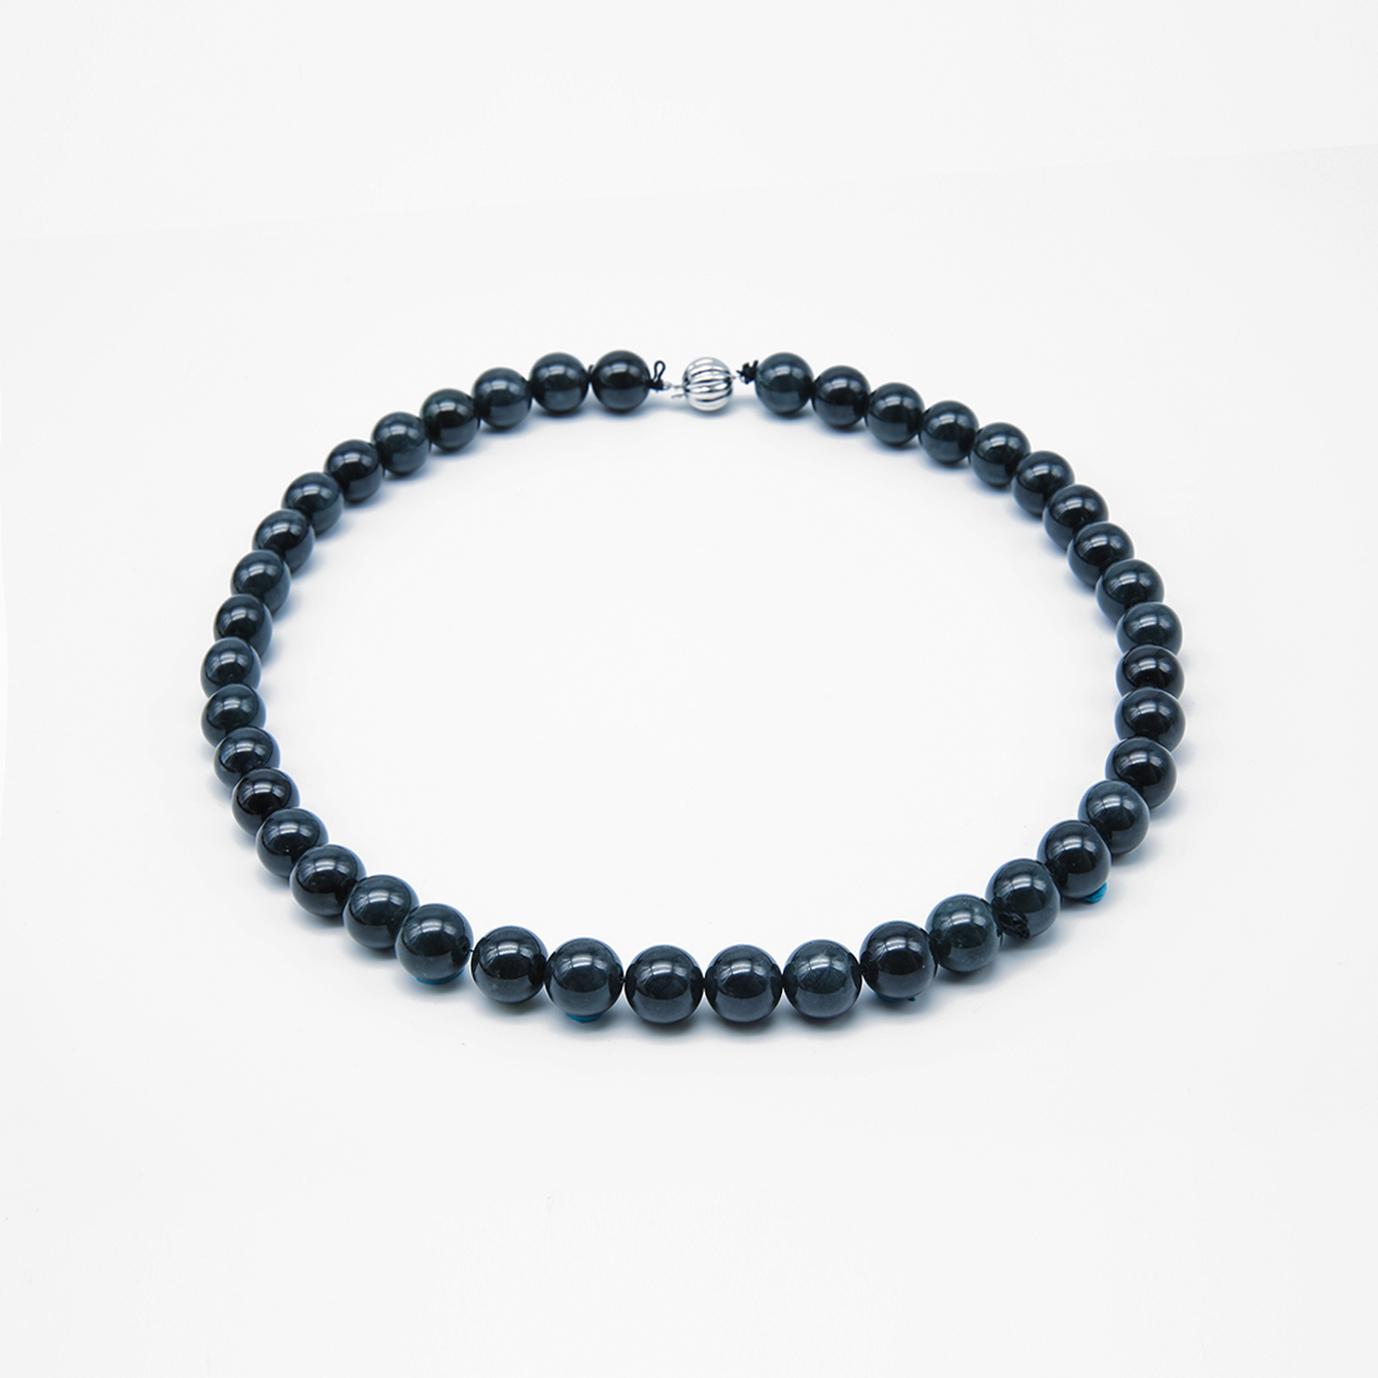 Black Jadeite Jade Pearl Necklace